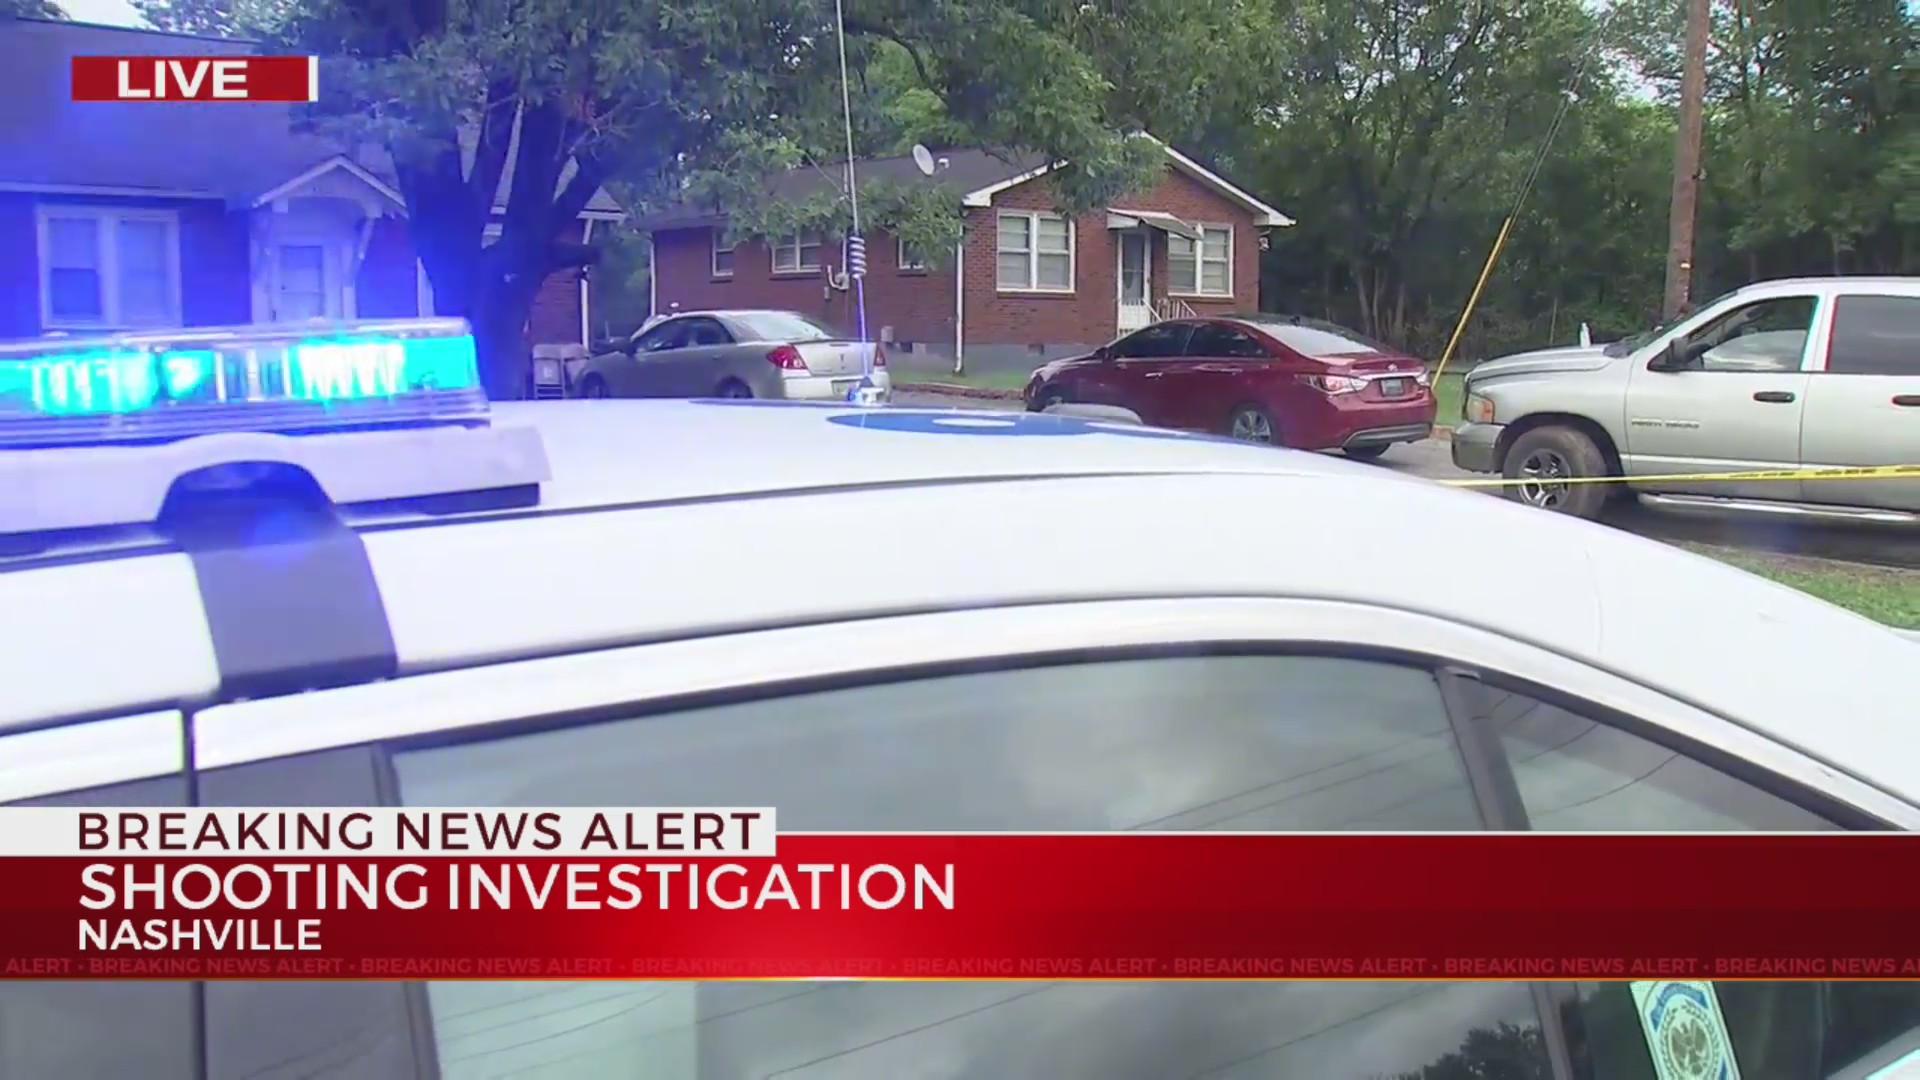 Ashland City Highway Shooting Investigation - 5/27/20